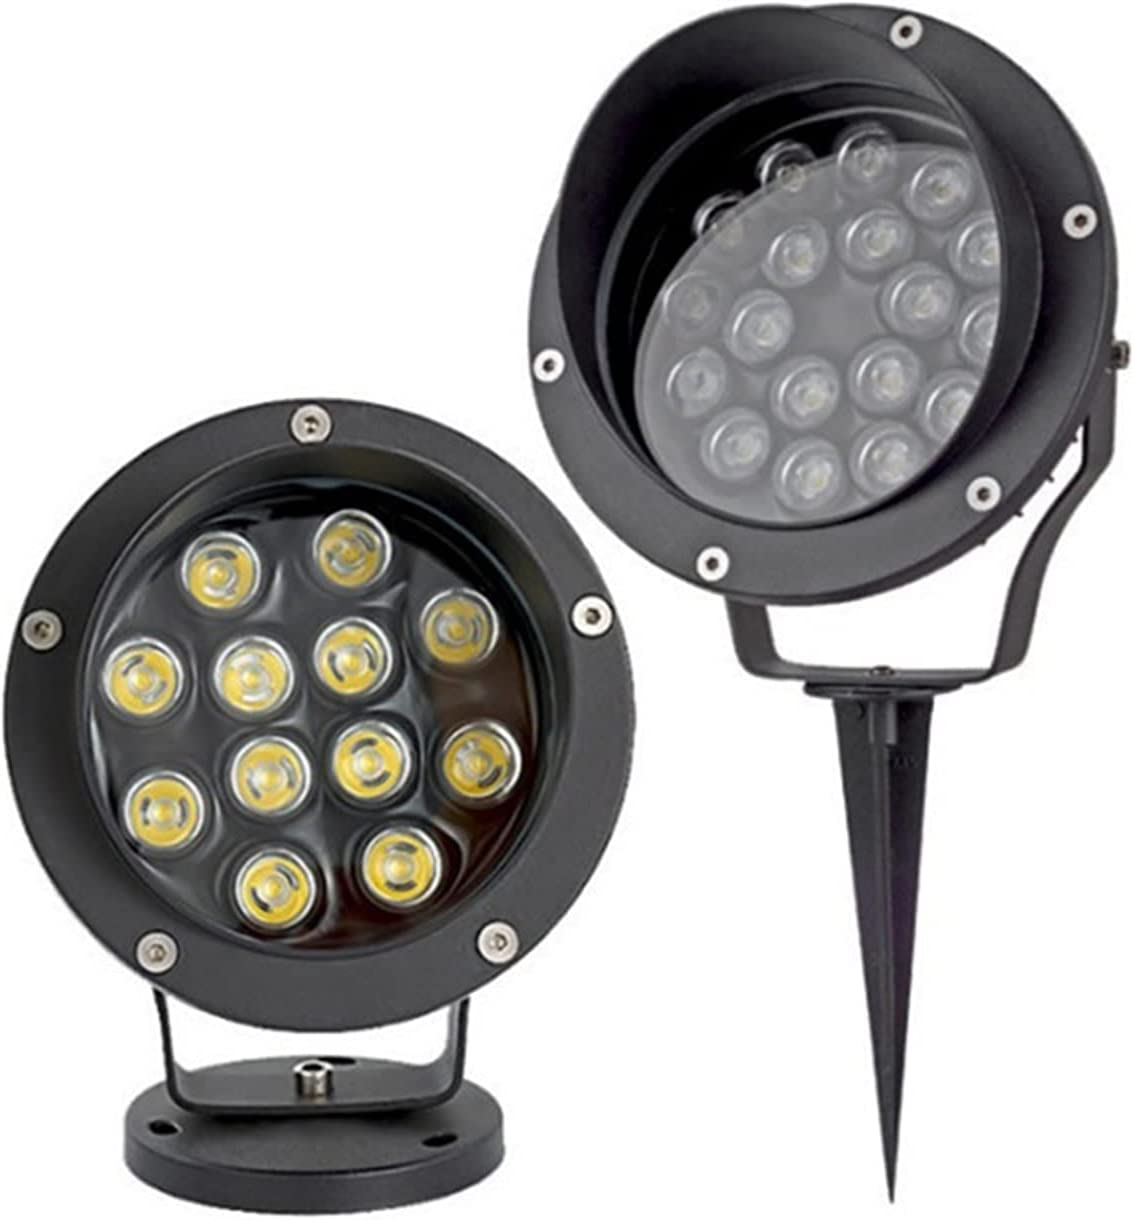 ZHM 2Pack Outdoor Garden Lamp LED L 6W Lawn Waterproof Light Bombing free shipping Ranking TOP1